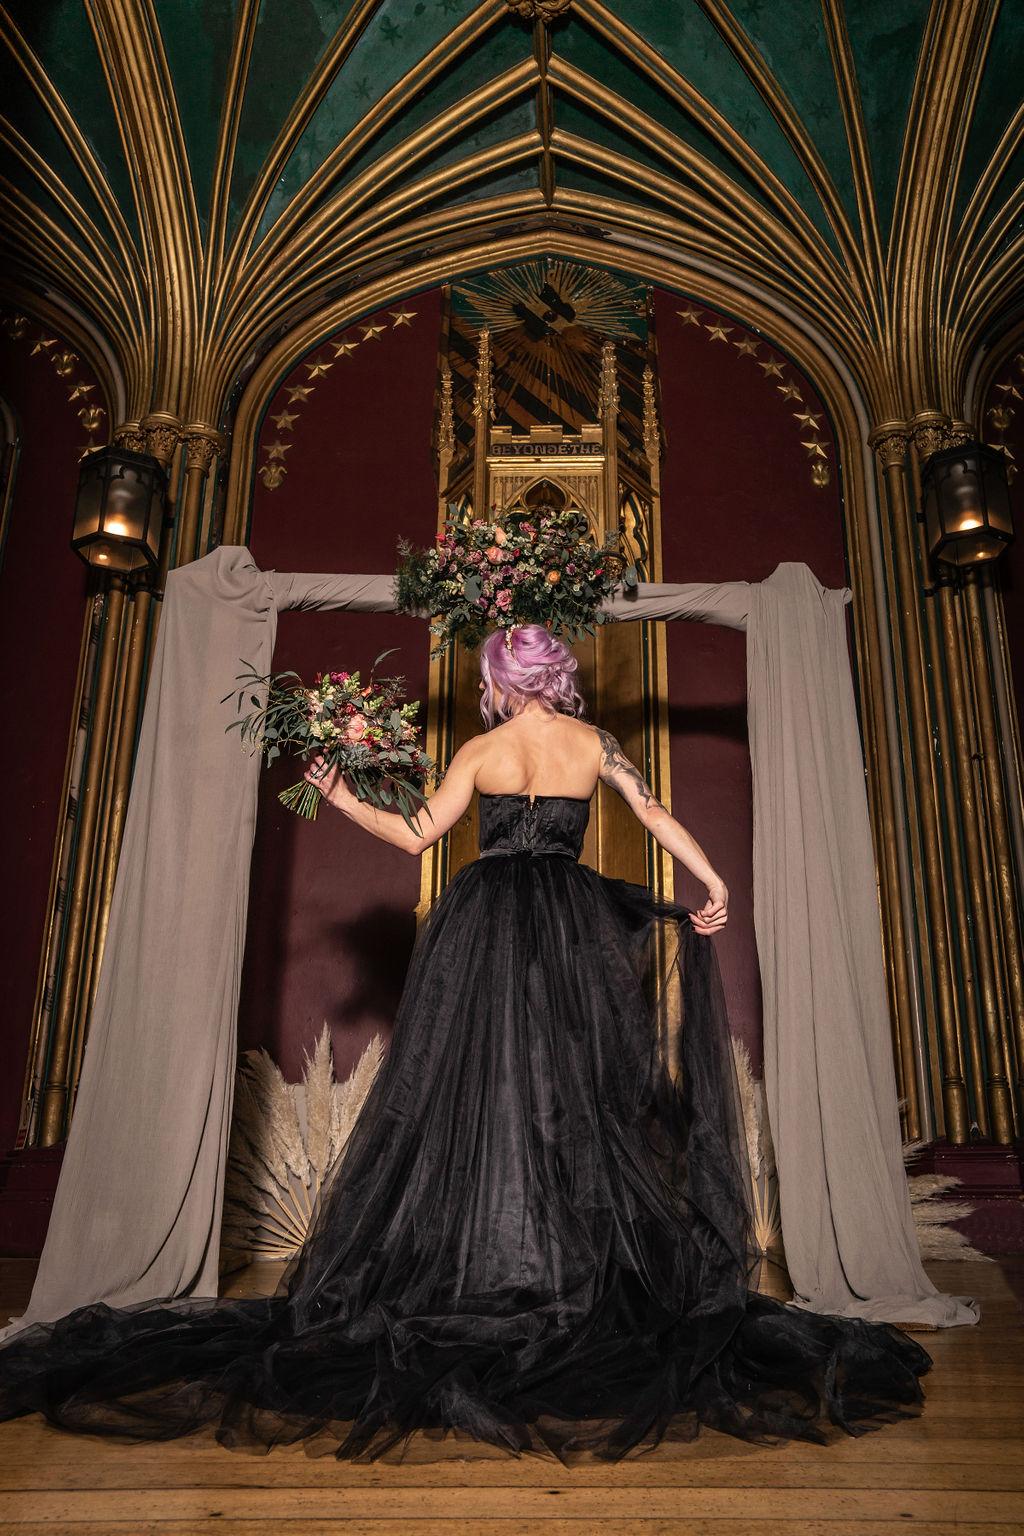 black wedding dress - gothic wedding dress- hisoric wedding venue - alternative wedding - unconventional wedding